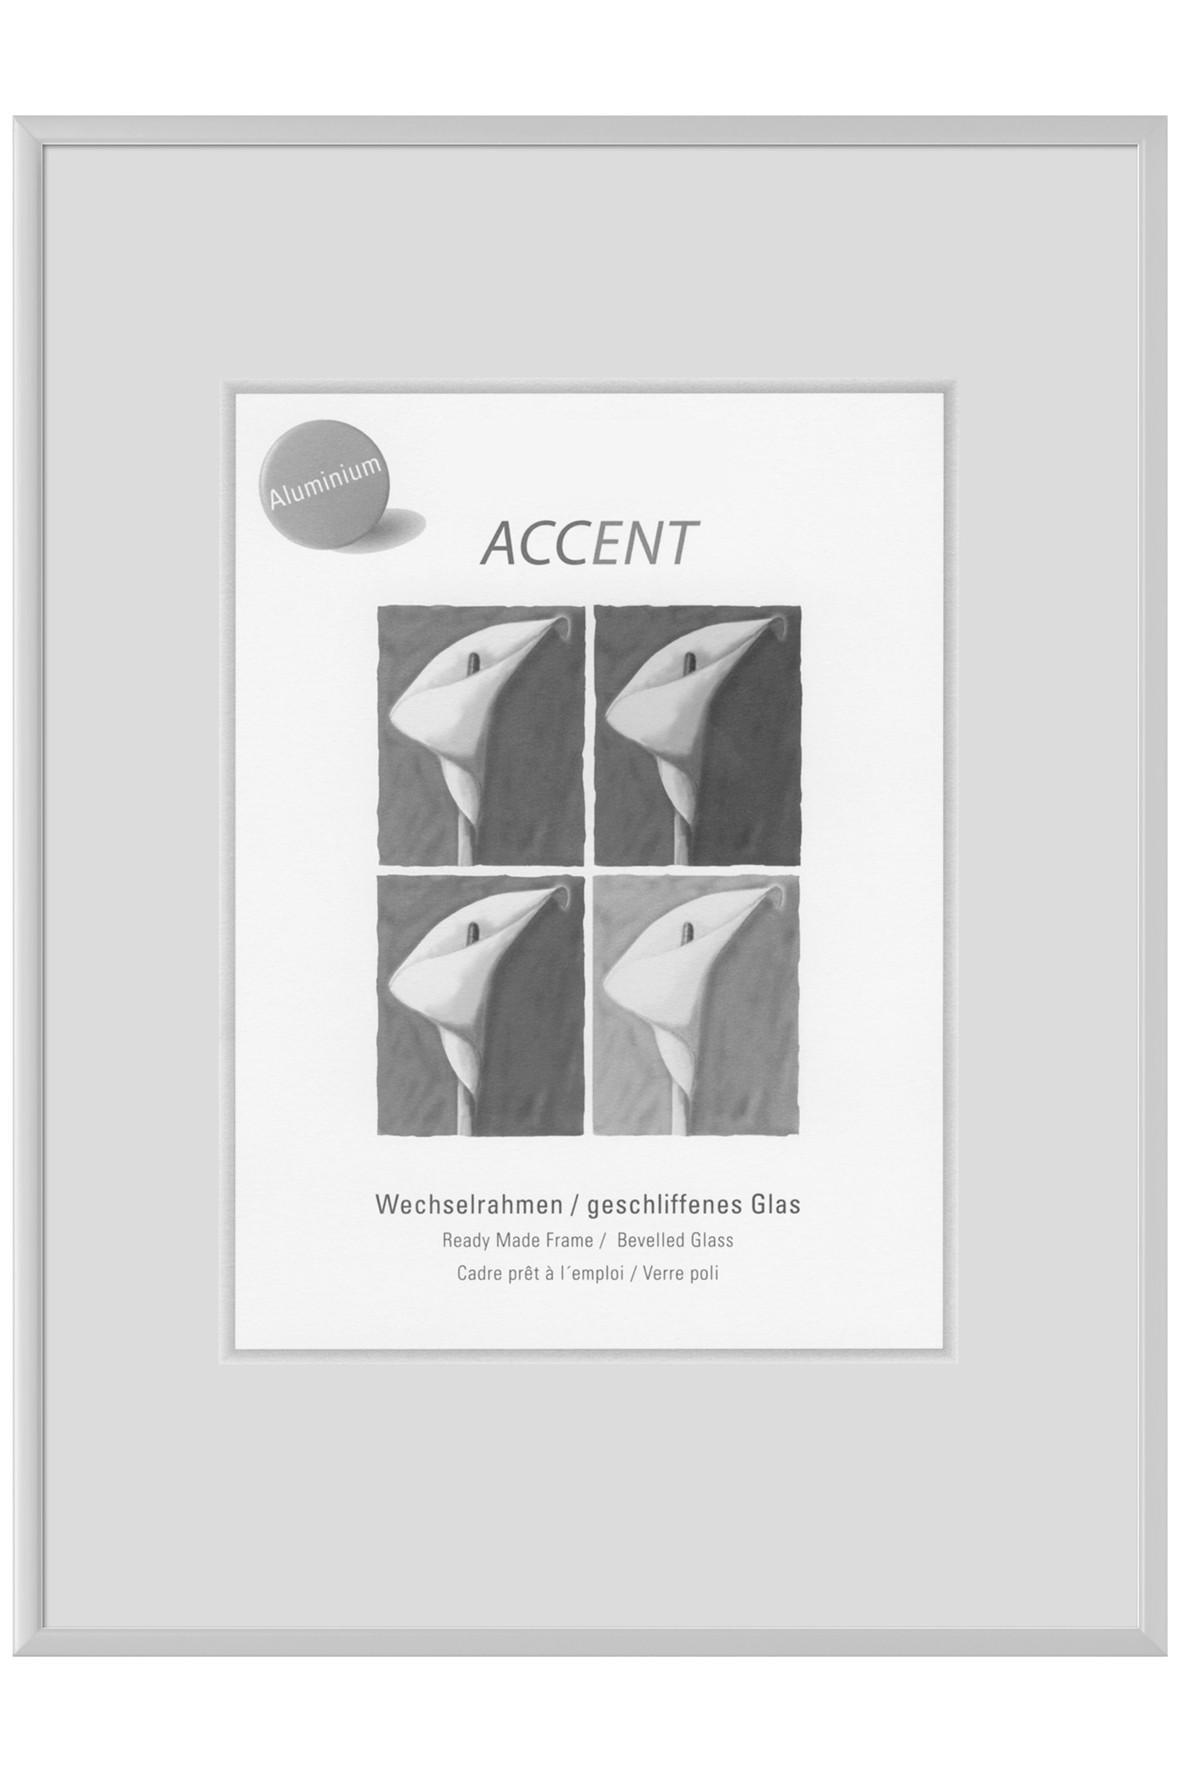 BILDERRAHMEN in Silberfarben - Silberfarben, Metall (31.5/41.5cm)